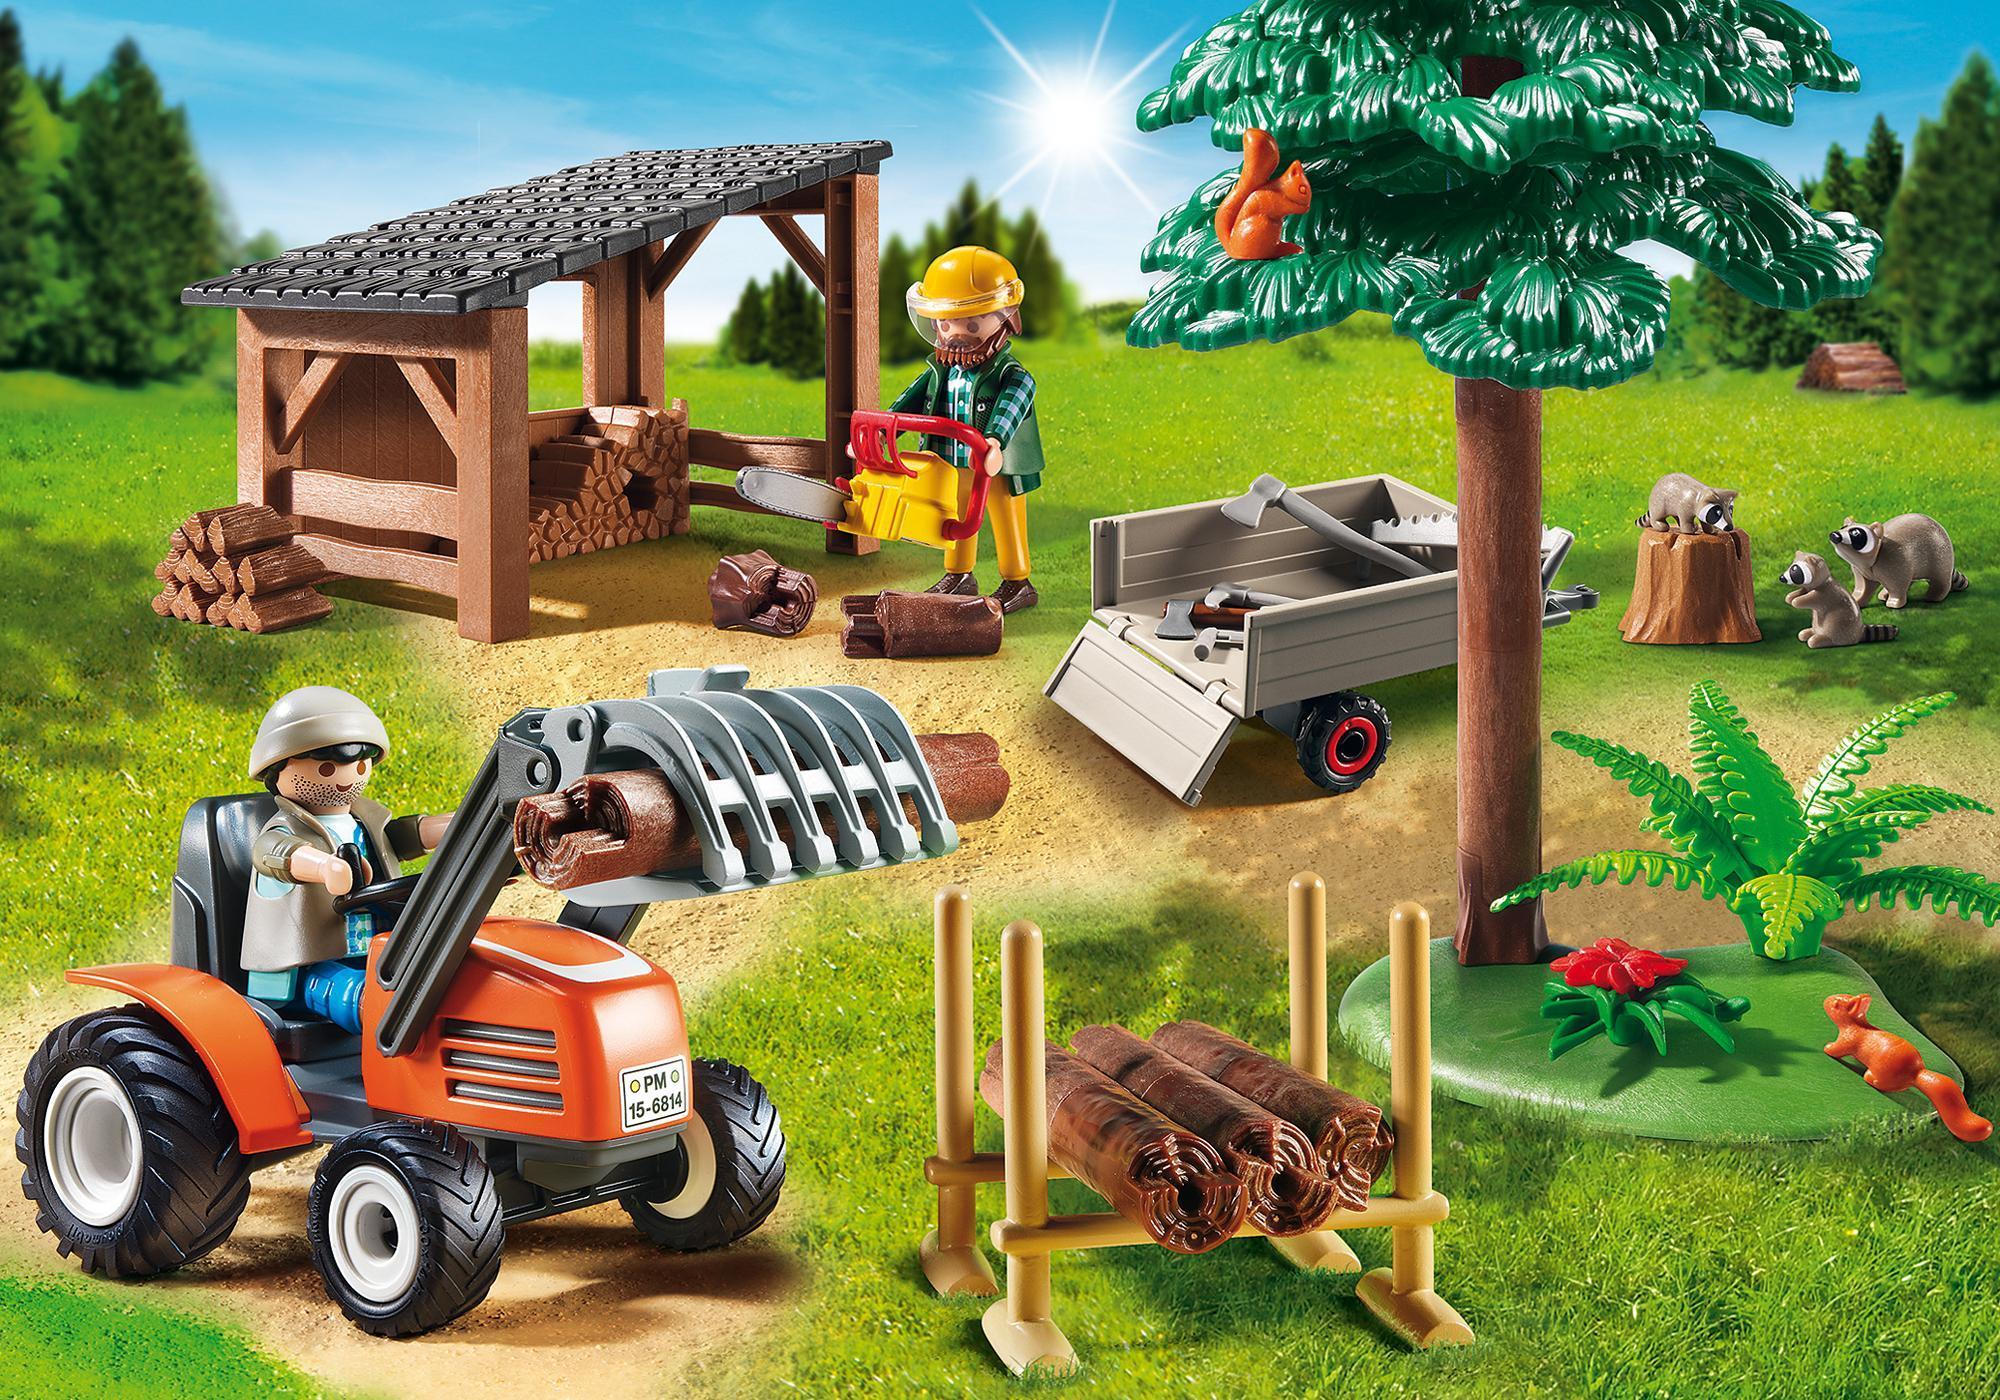 Holzfäller mit traktor playmobil deutschland